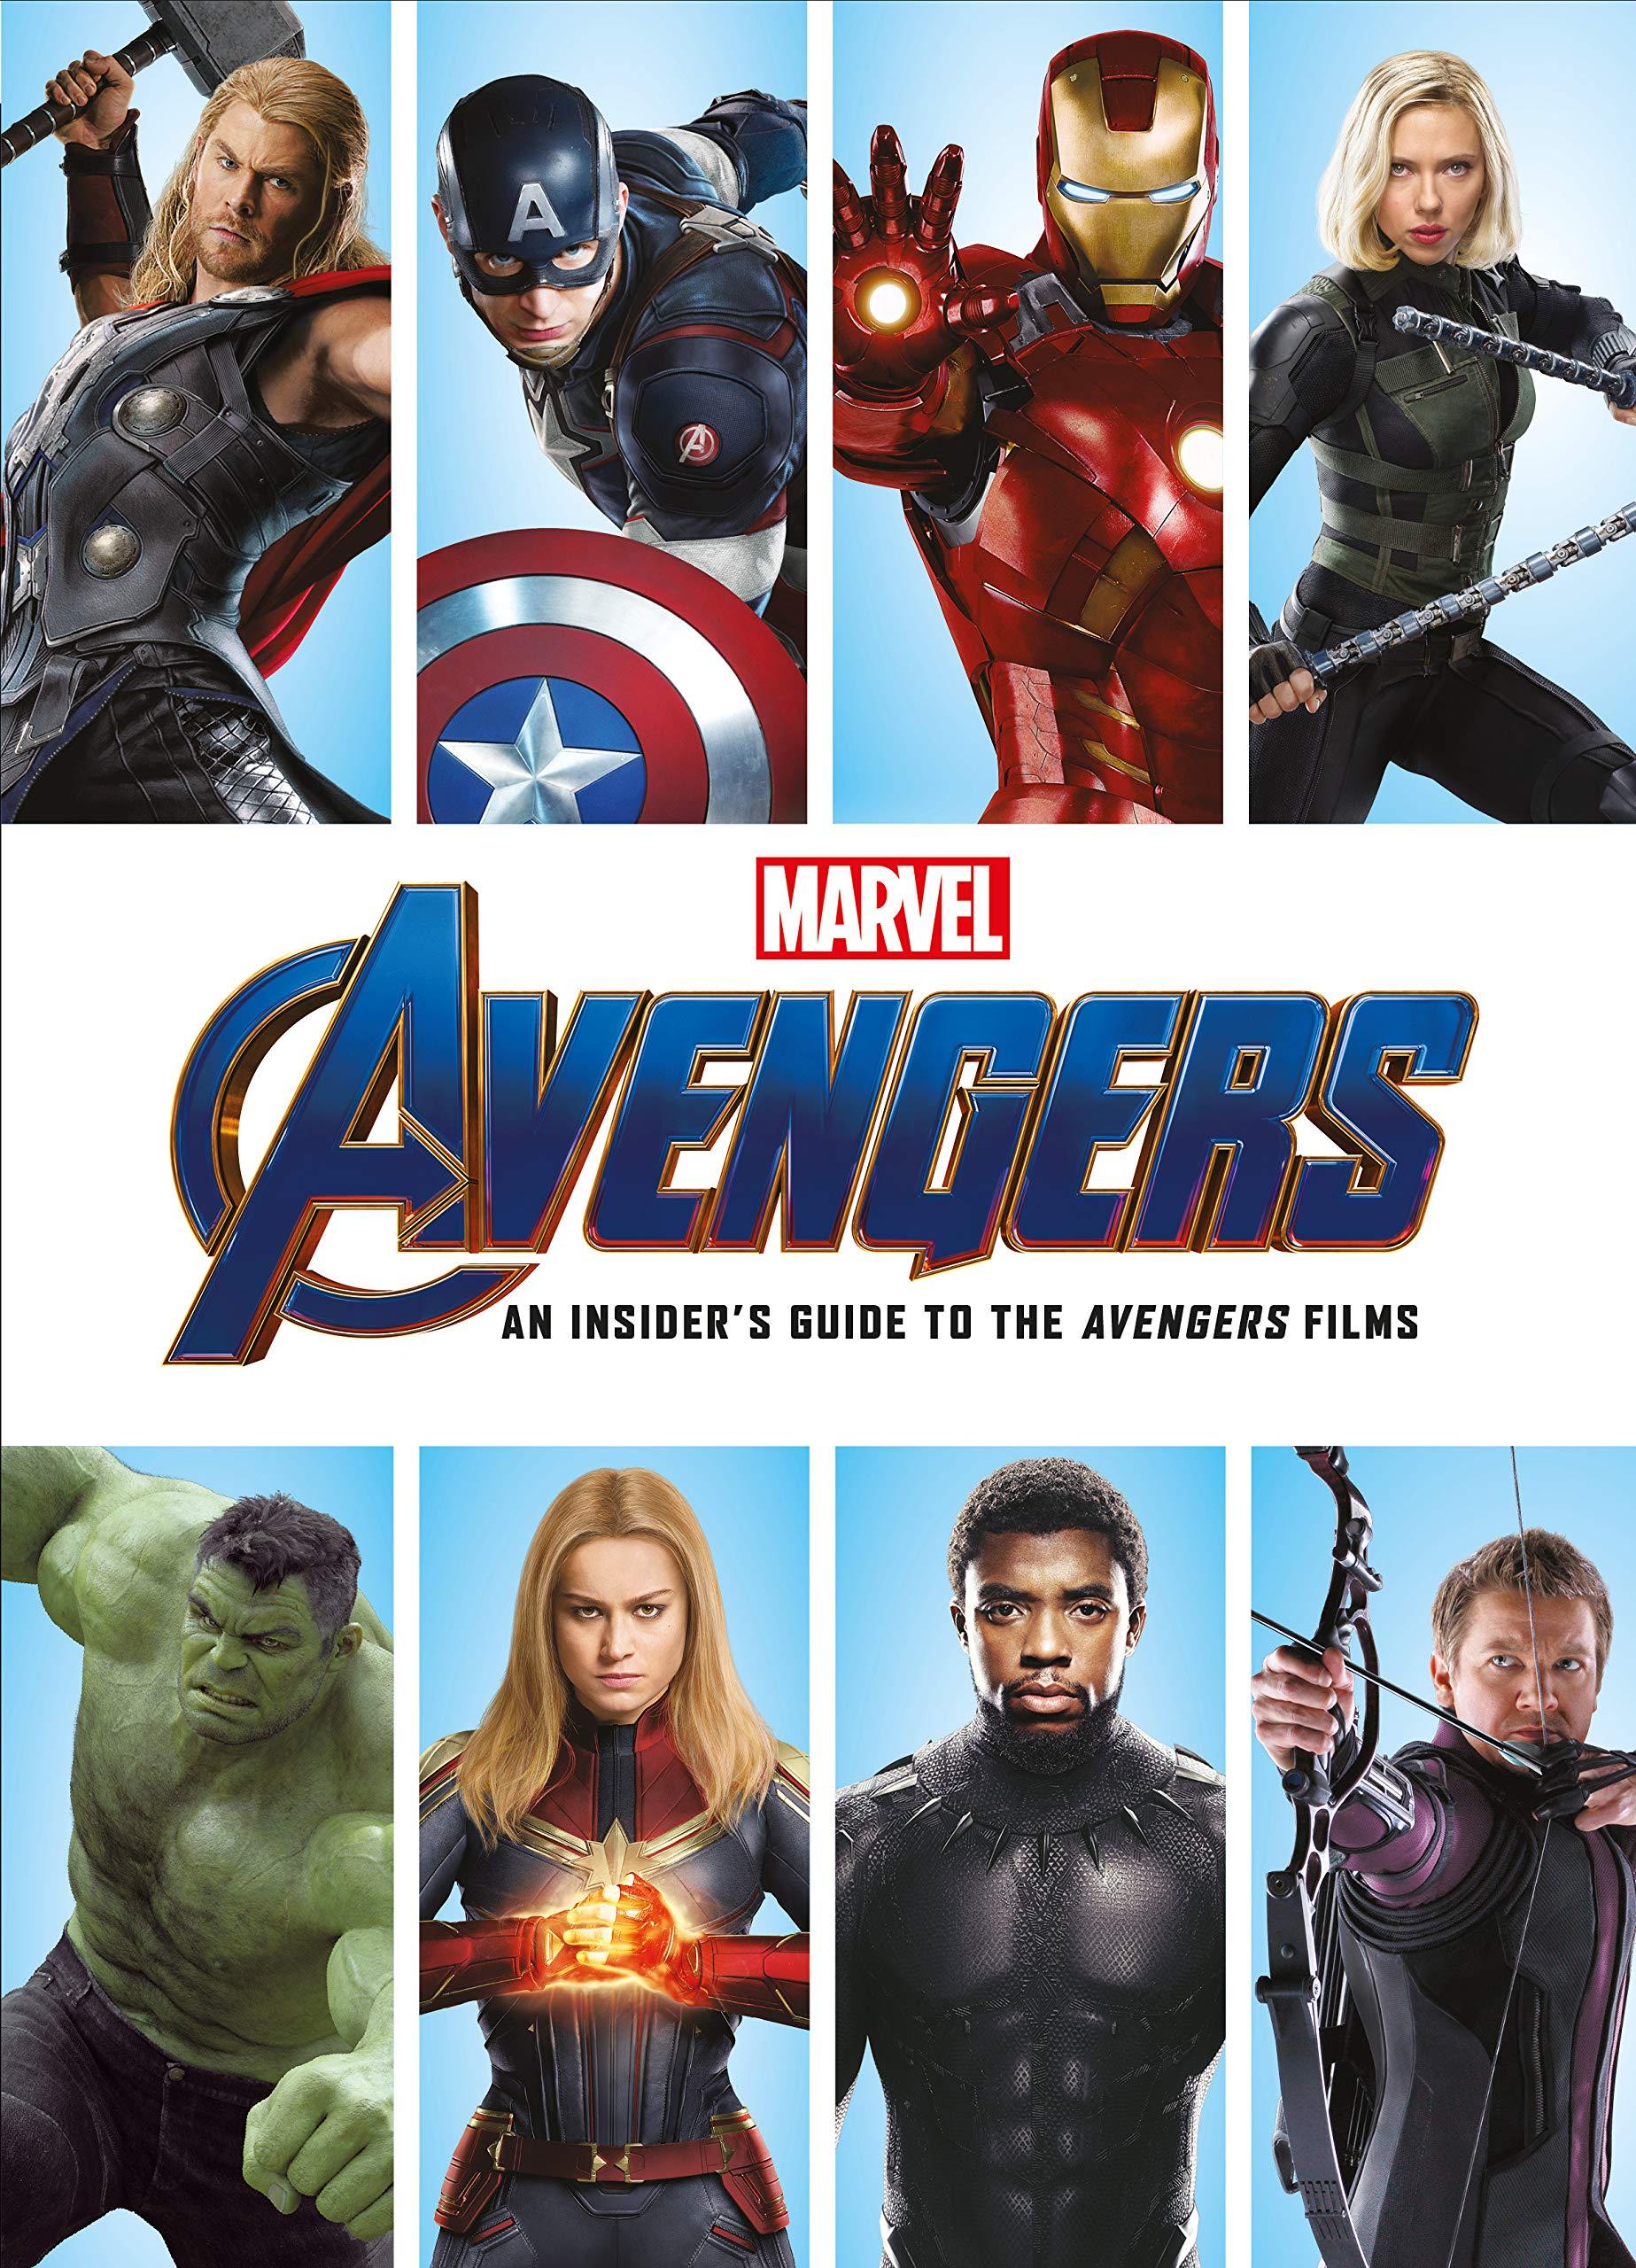 Avengers An Insider S Guide To The Avengers Films Marvel Cinematic Universe Wiki Fandom